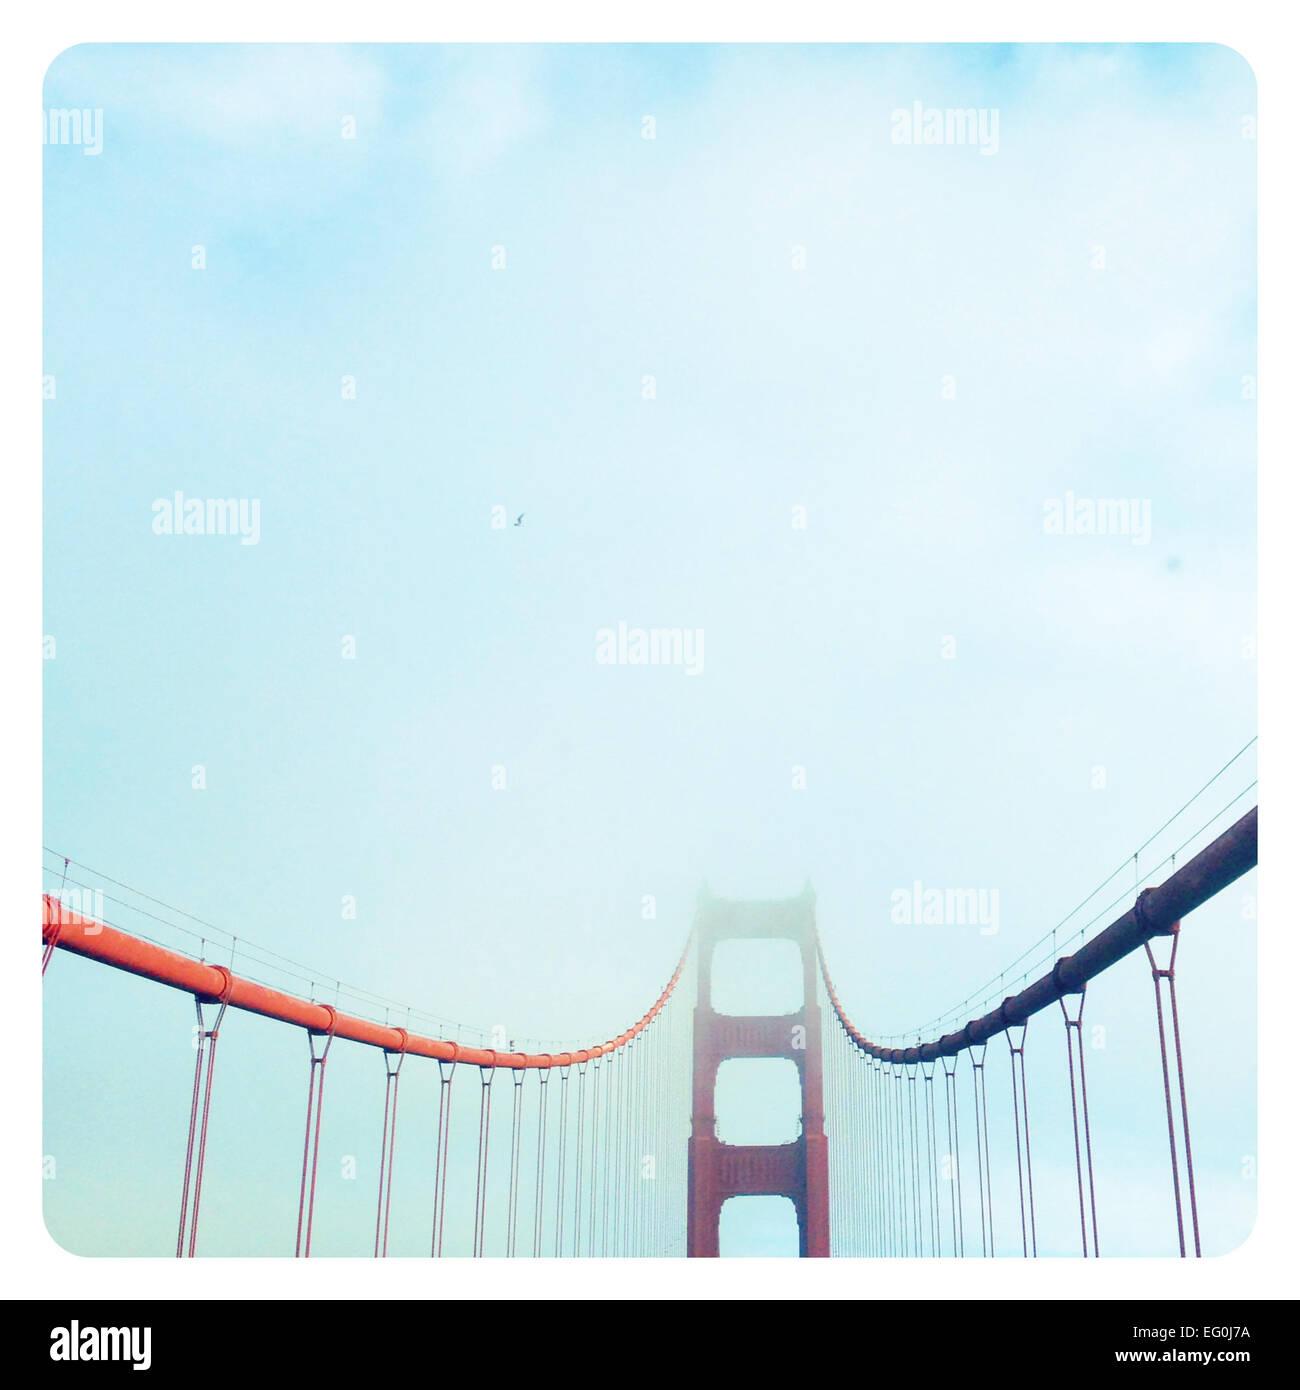 Golden Gate Bridge in fog, San Francisco, California, America, USA - Stock Image